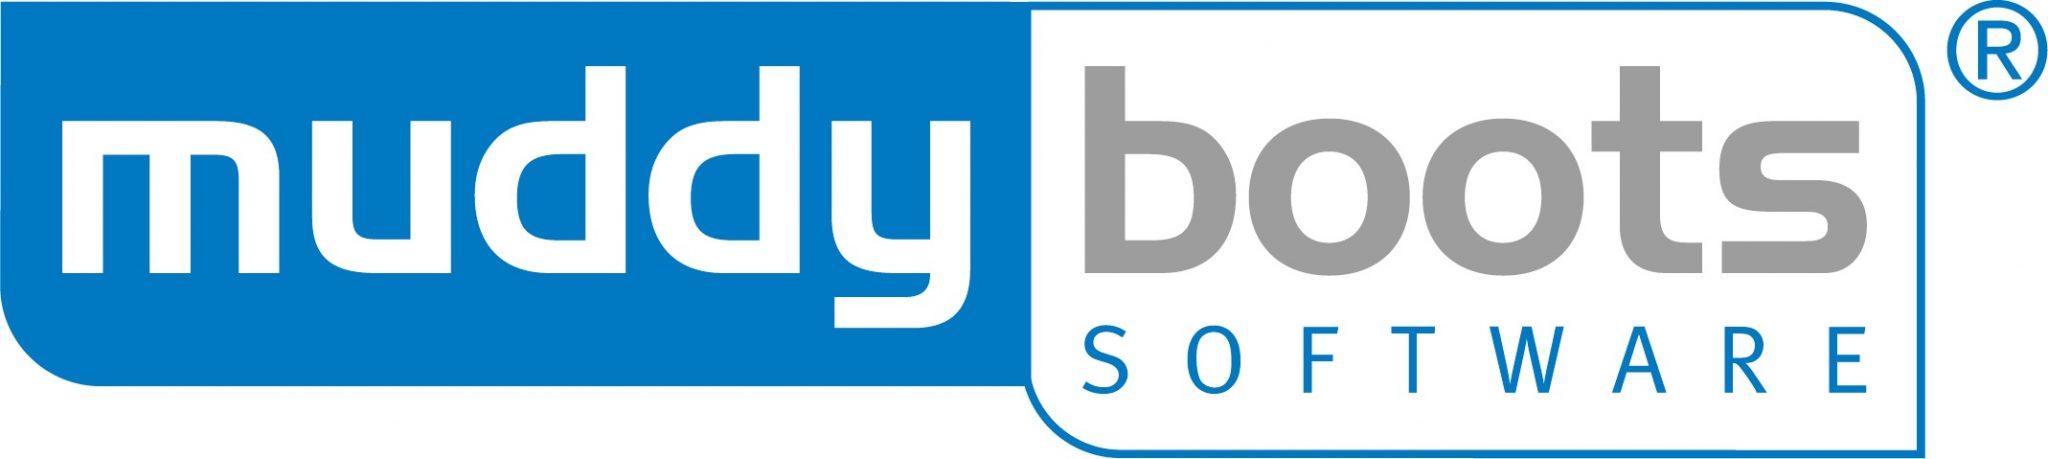 Muddy Boots Software Logo